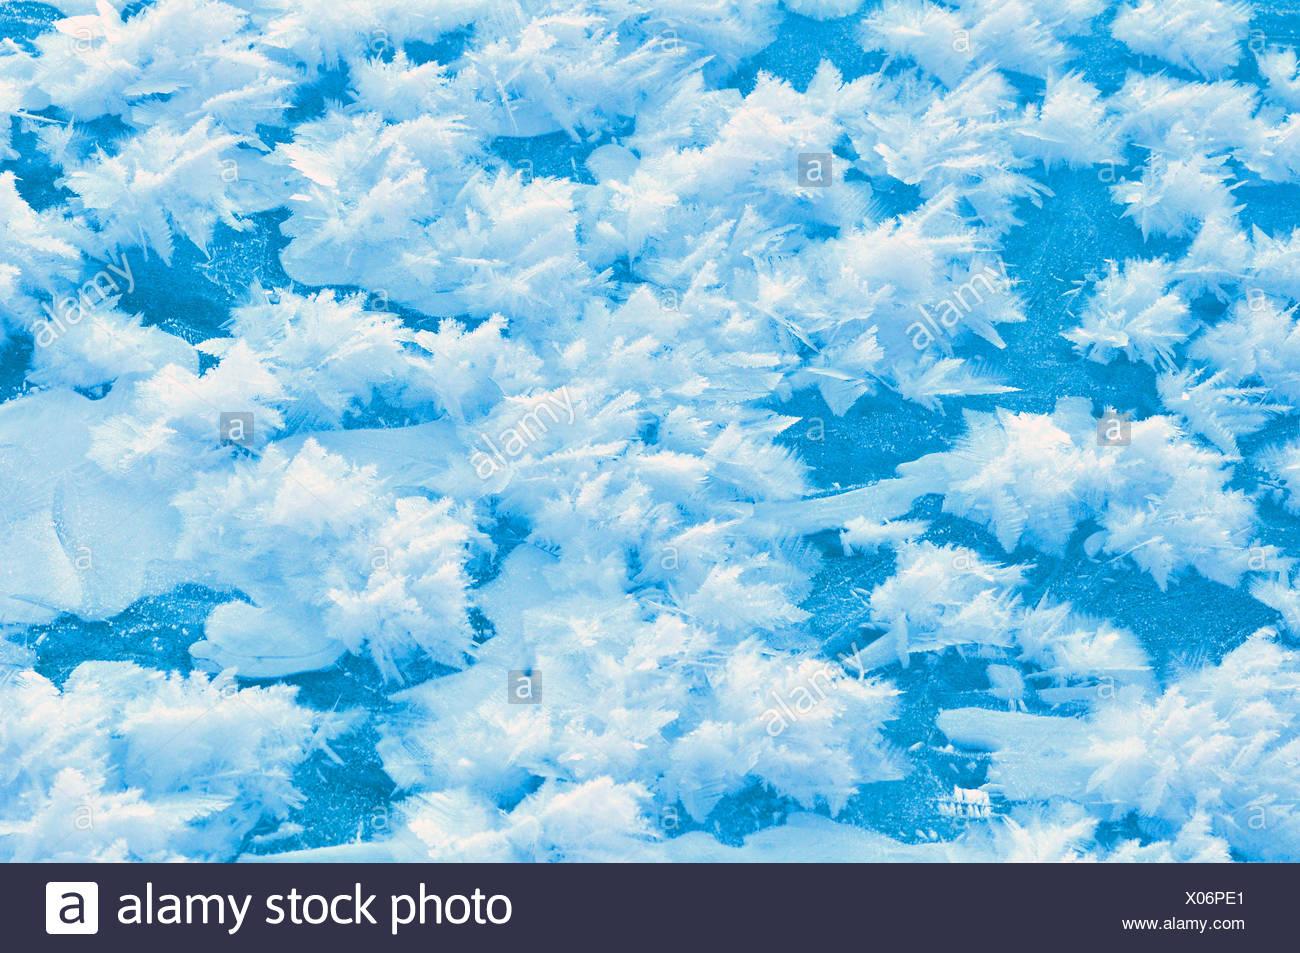 ice crystals, Sweden, Lapland, Norrbotten, Abisko National Park - Stock Image